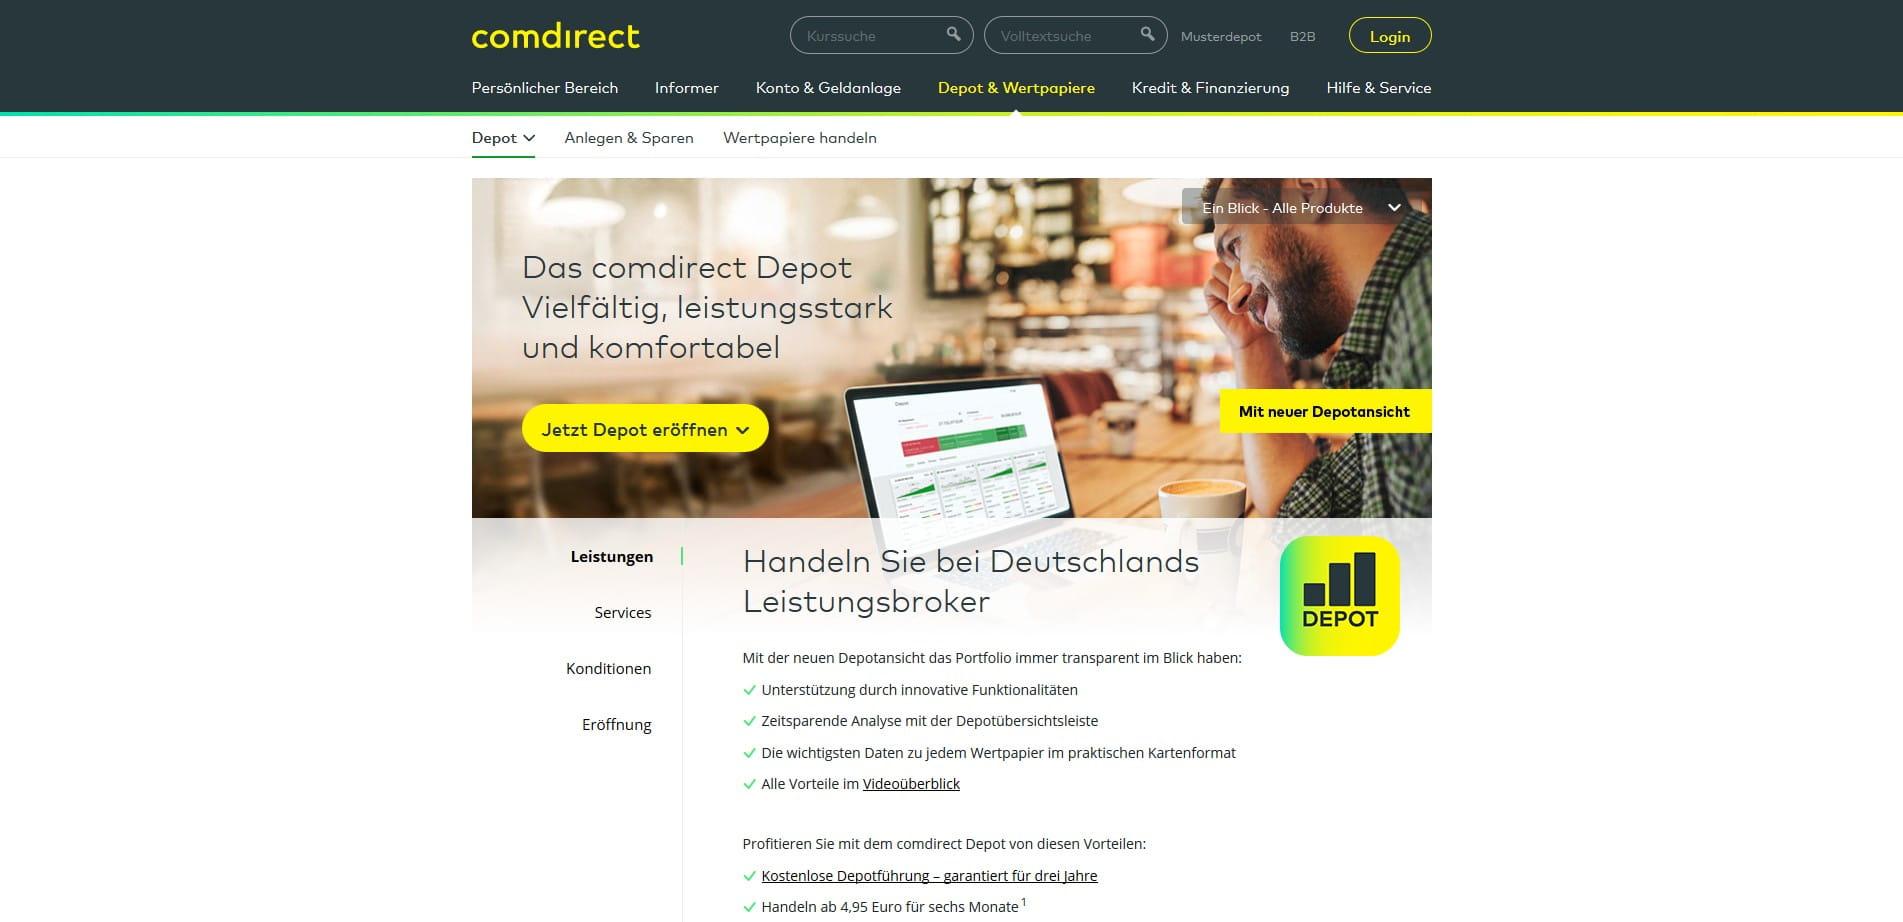 Comdirect DepotgebГјhren